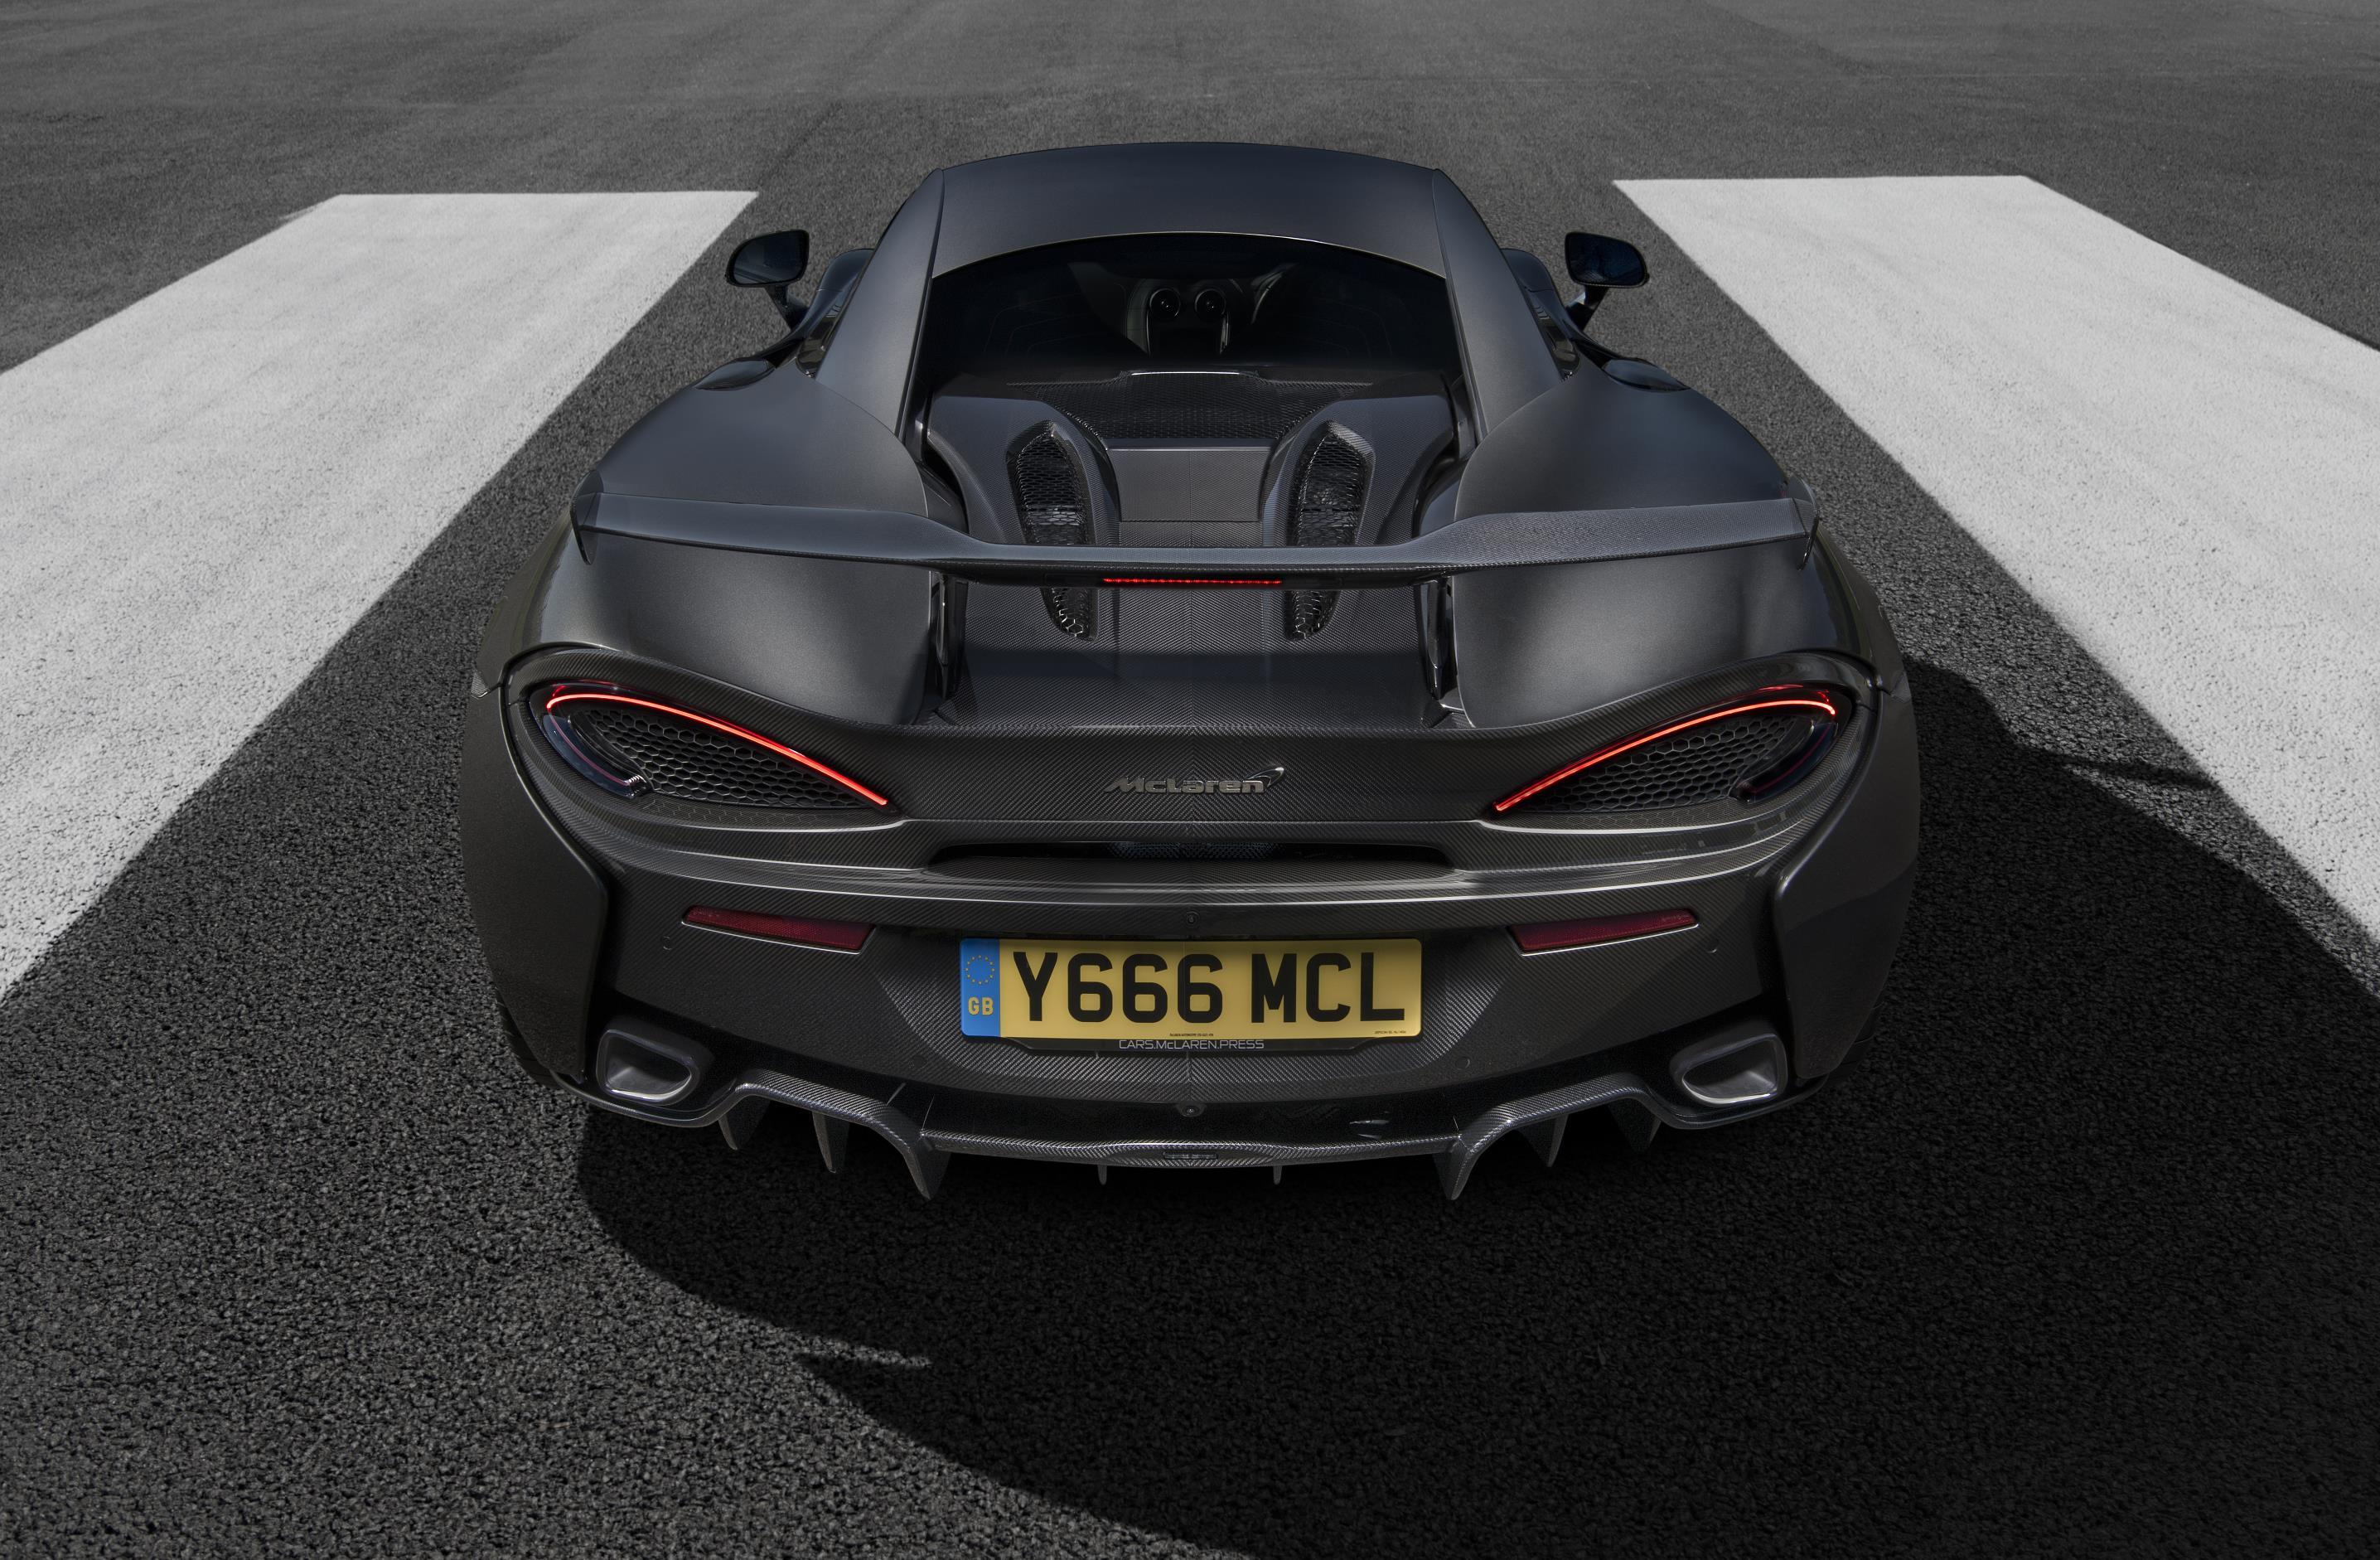 McLaren 570S Rear Wing